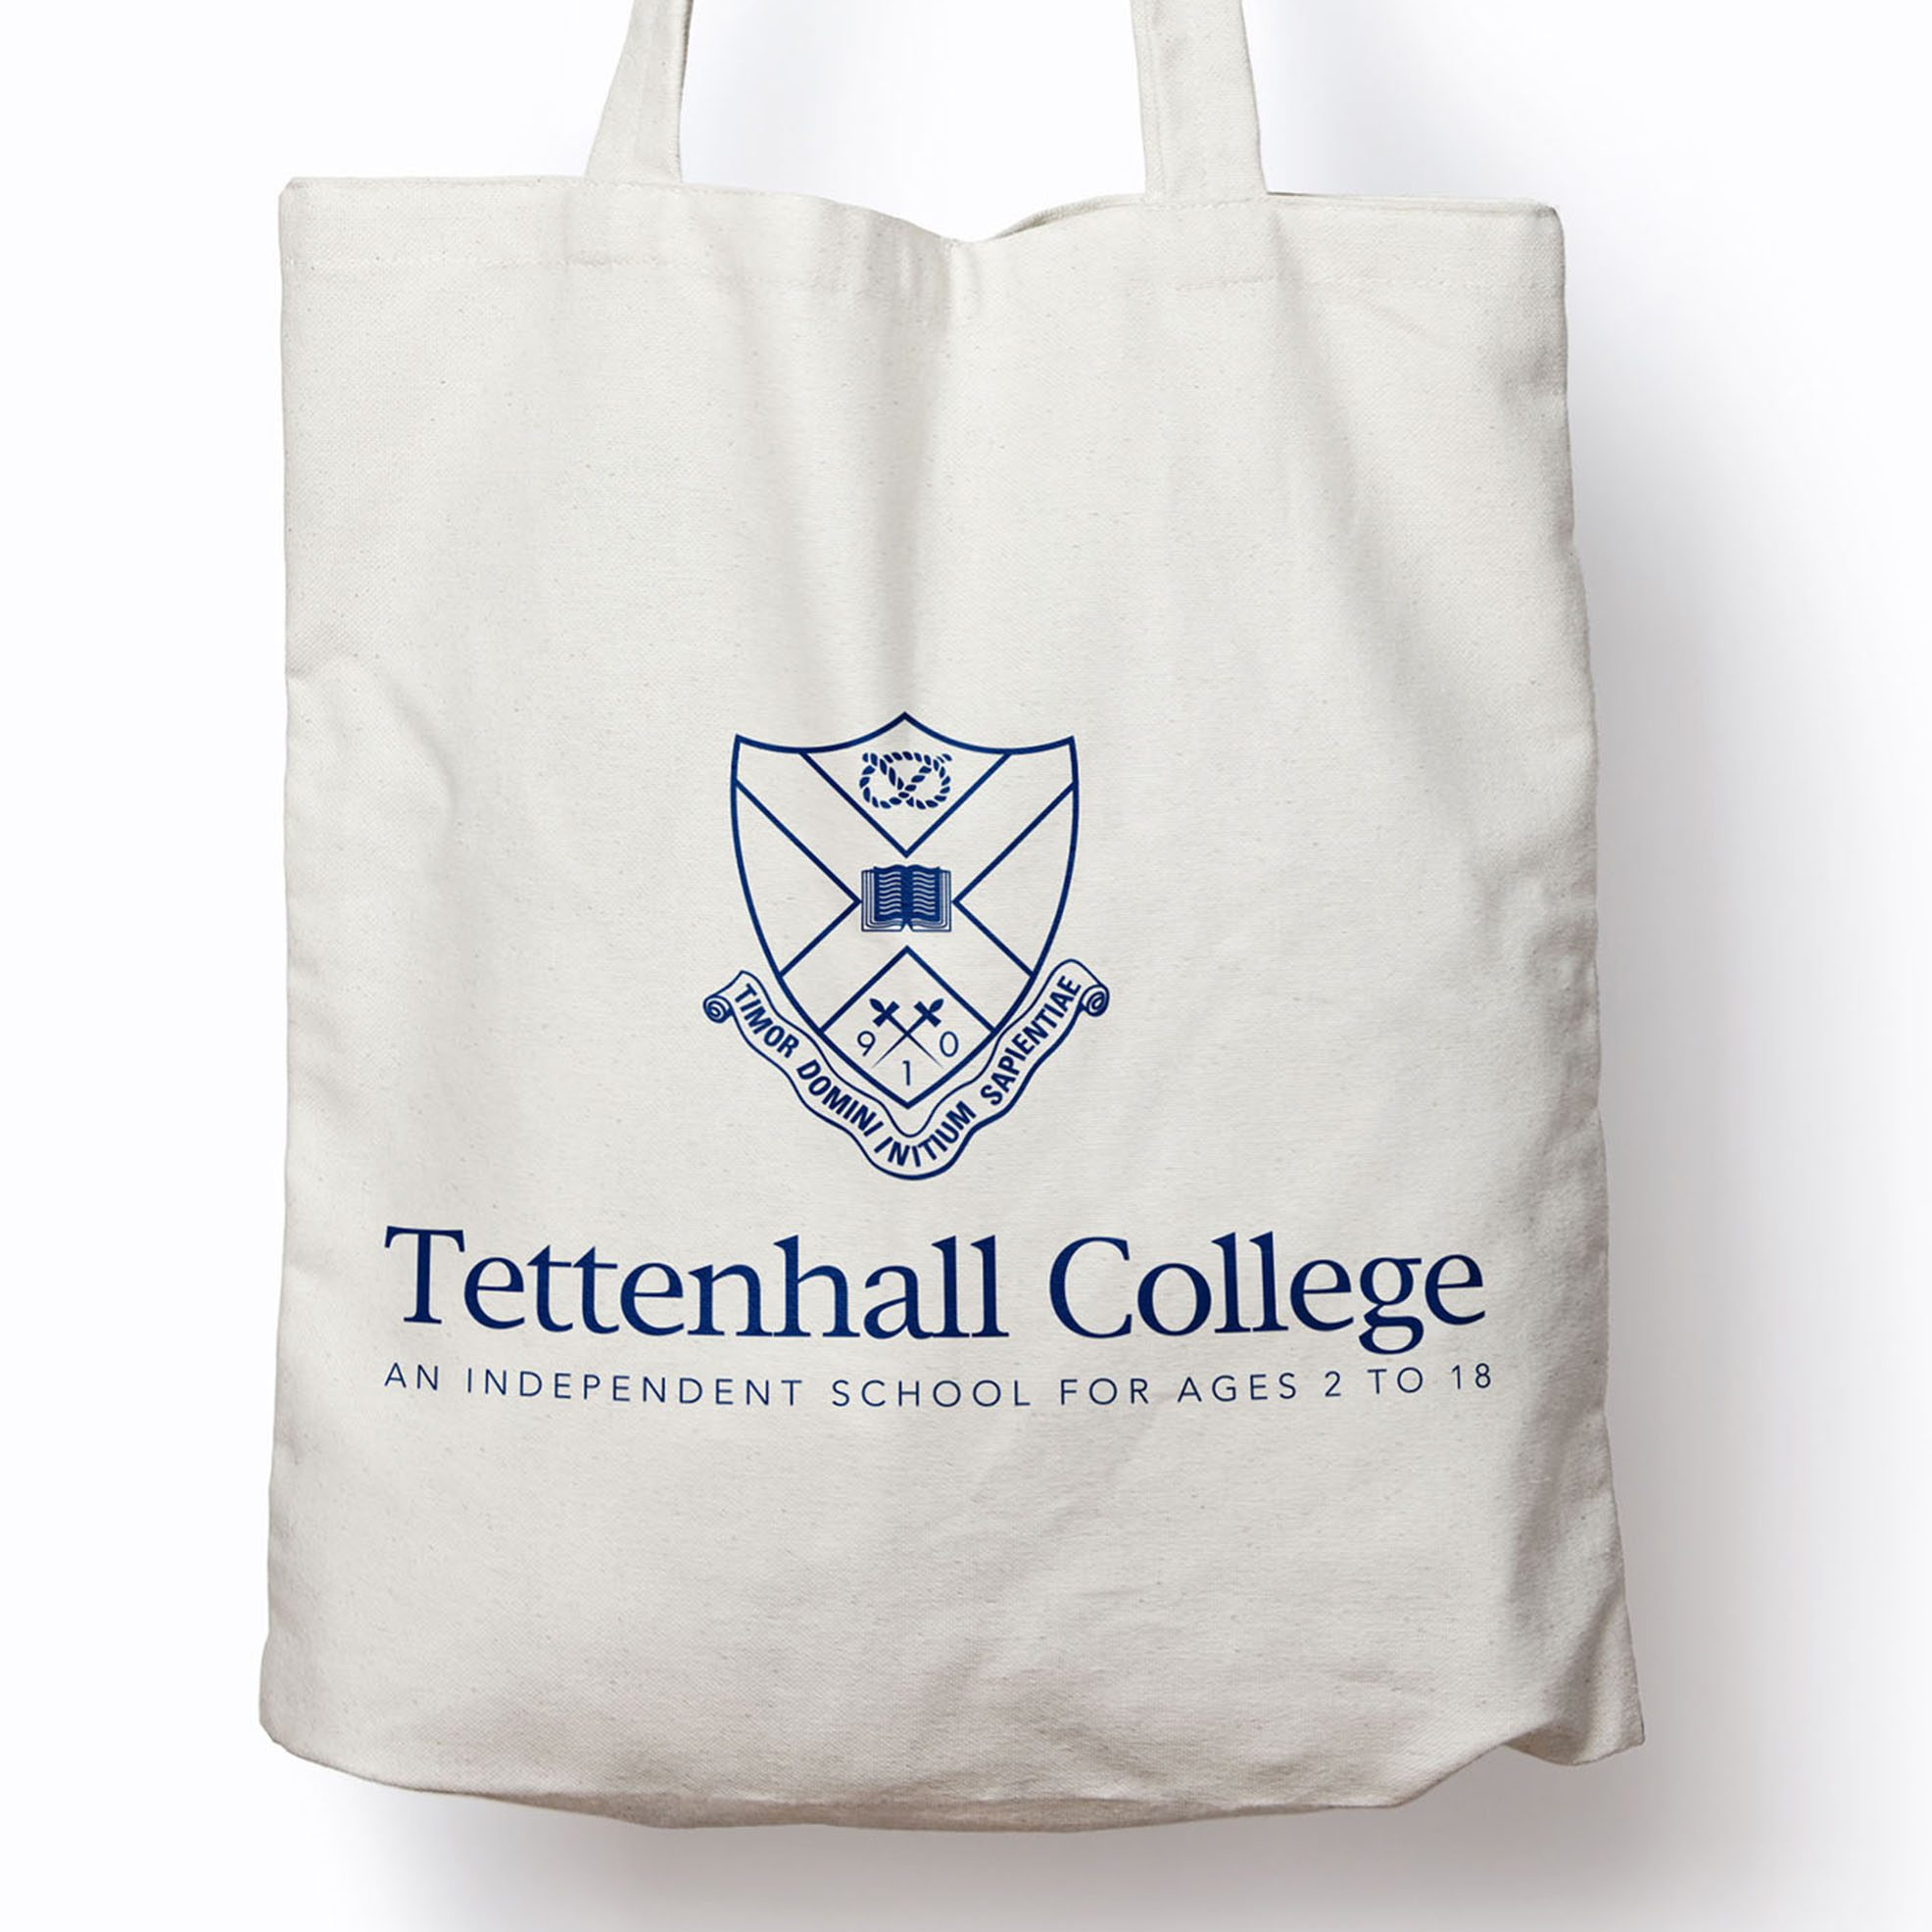 Tettenhall College Bag